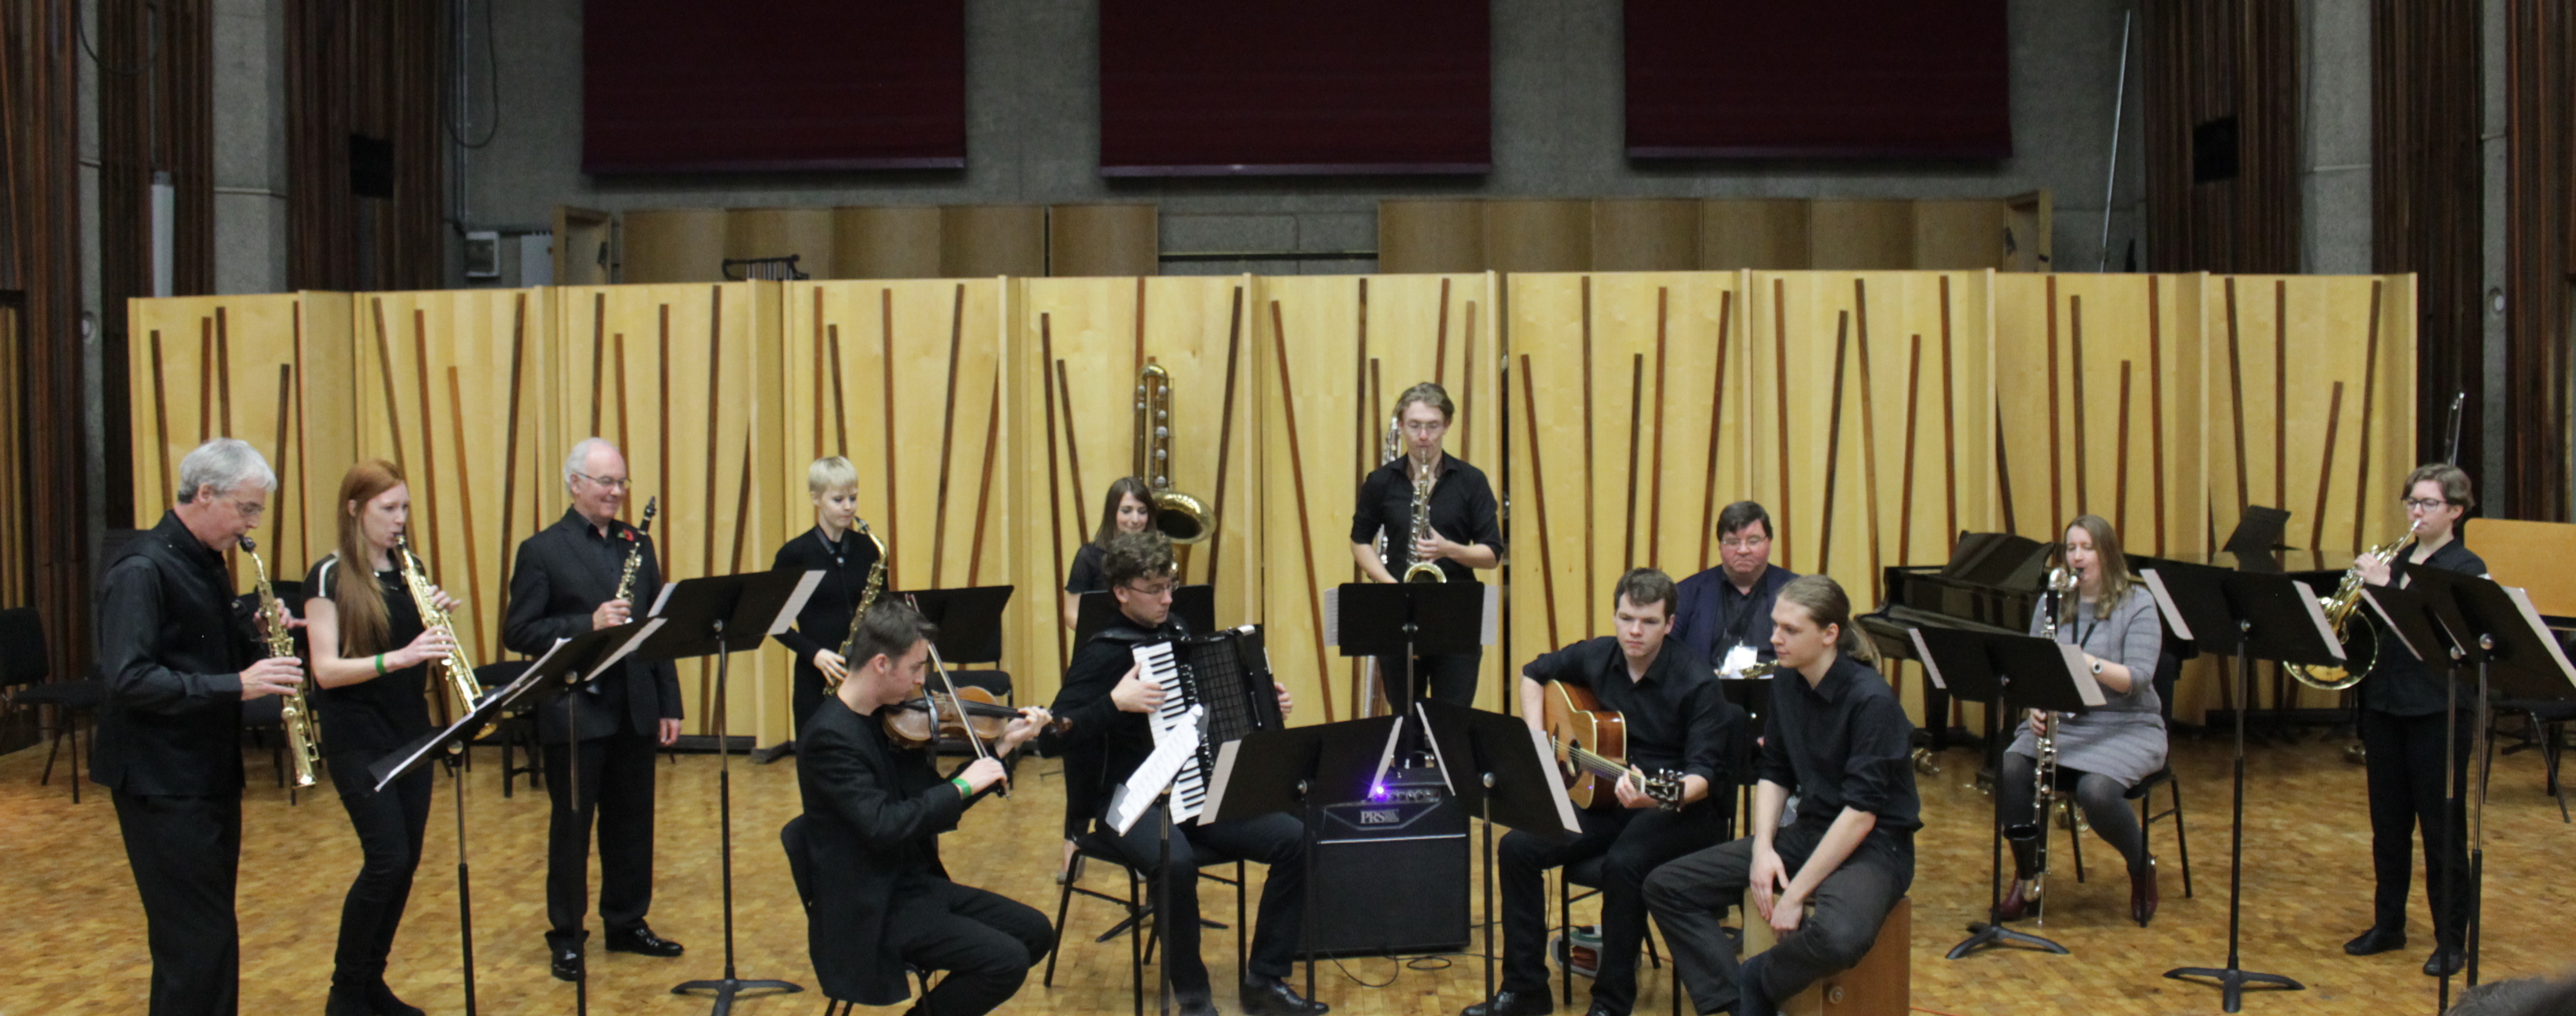 Richard Ingham's St. Kilda Ensemble